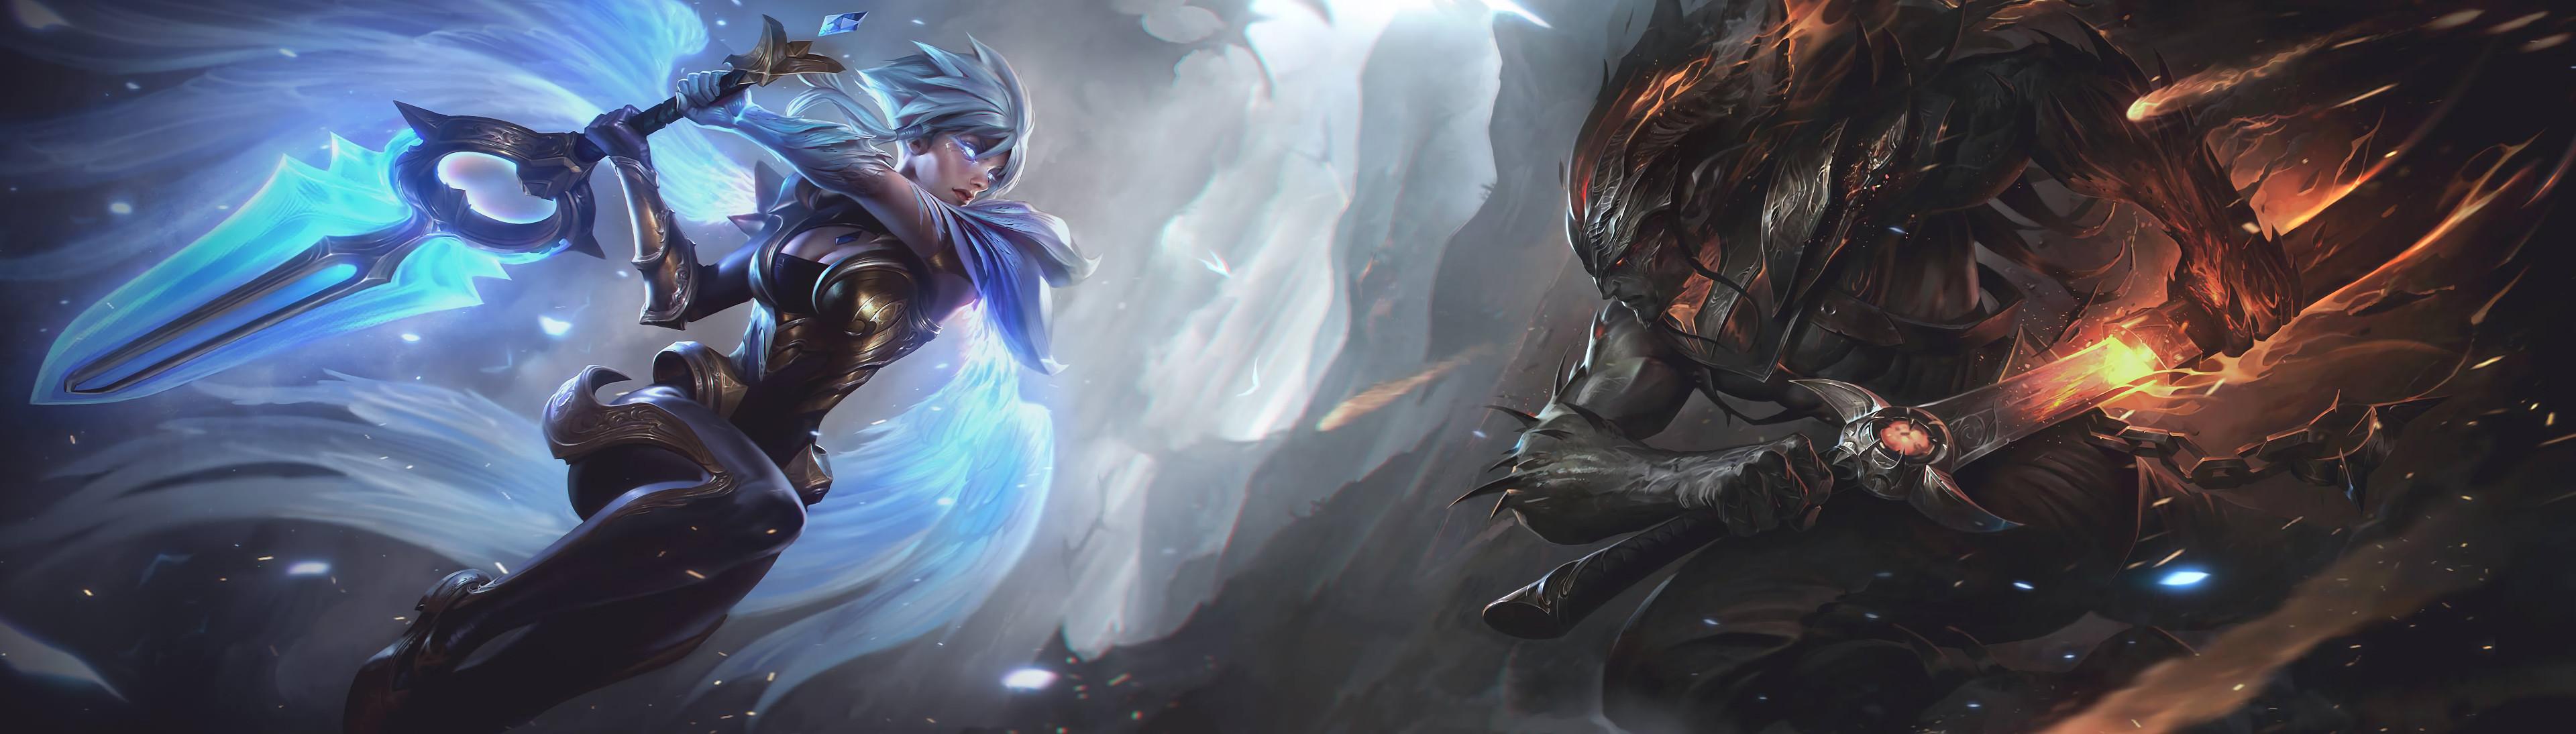 Dawnbringer Riven & Nightbringer Yasuo Combined Splash Art HD Wallpaper  Artwork League of Legends (2